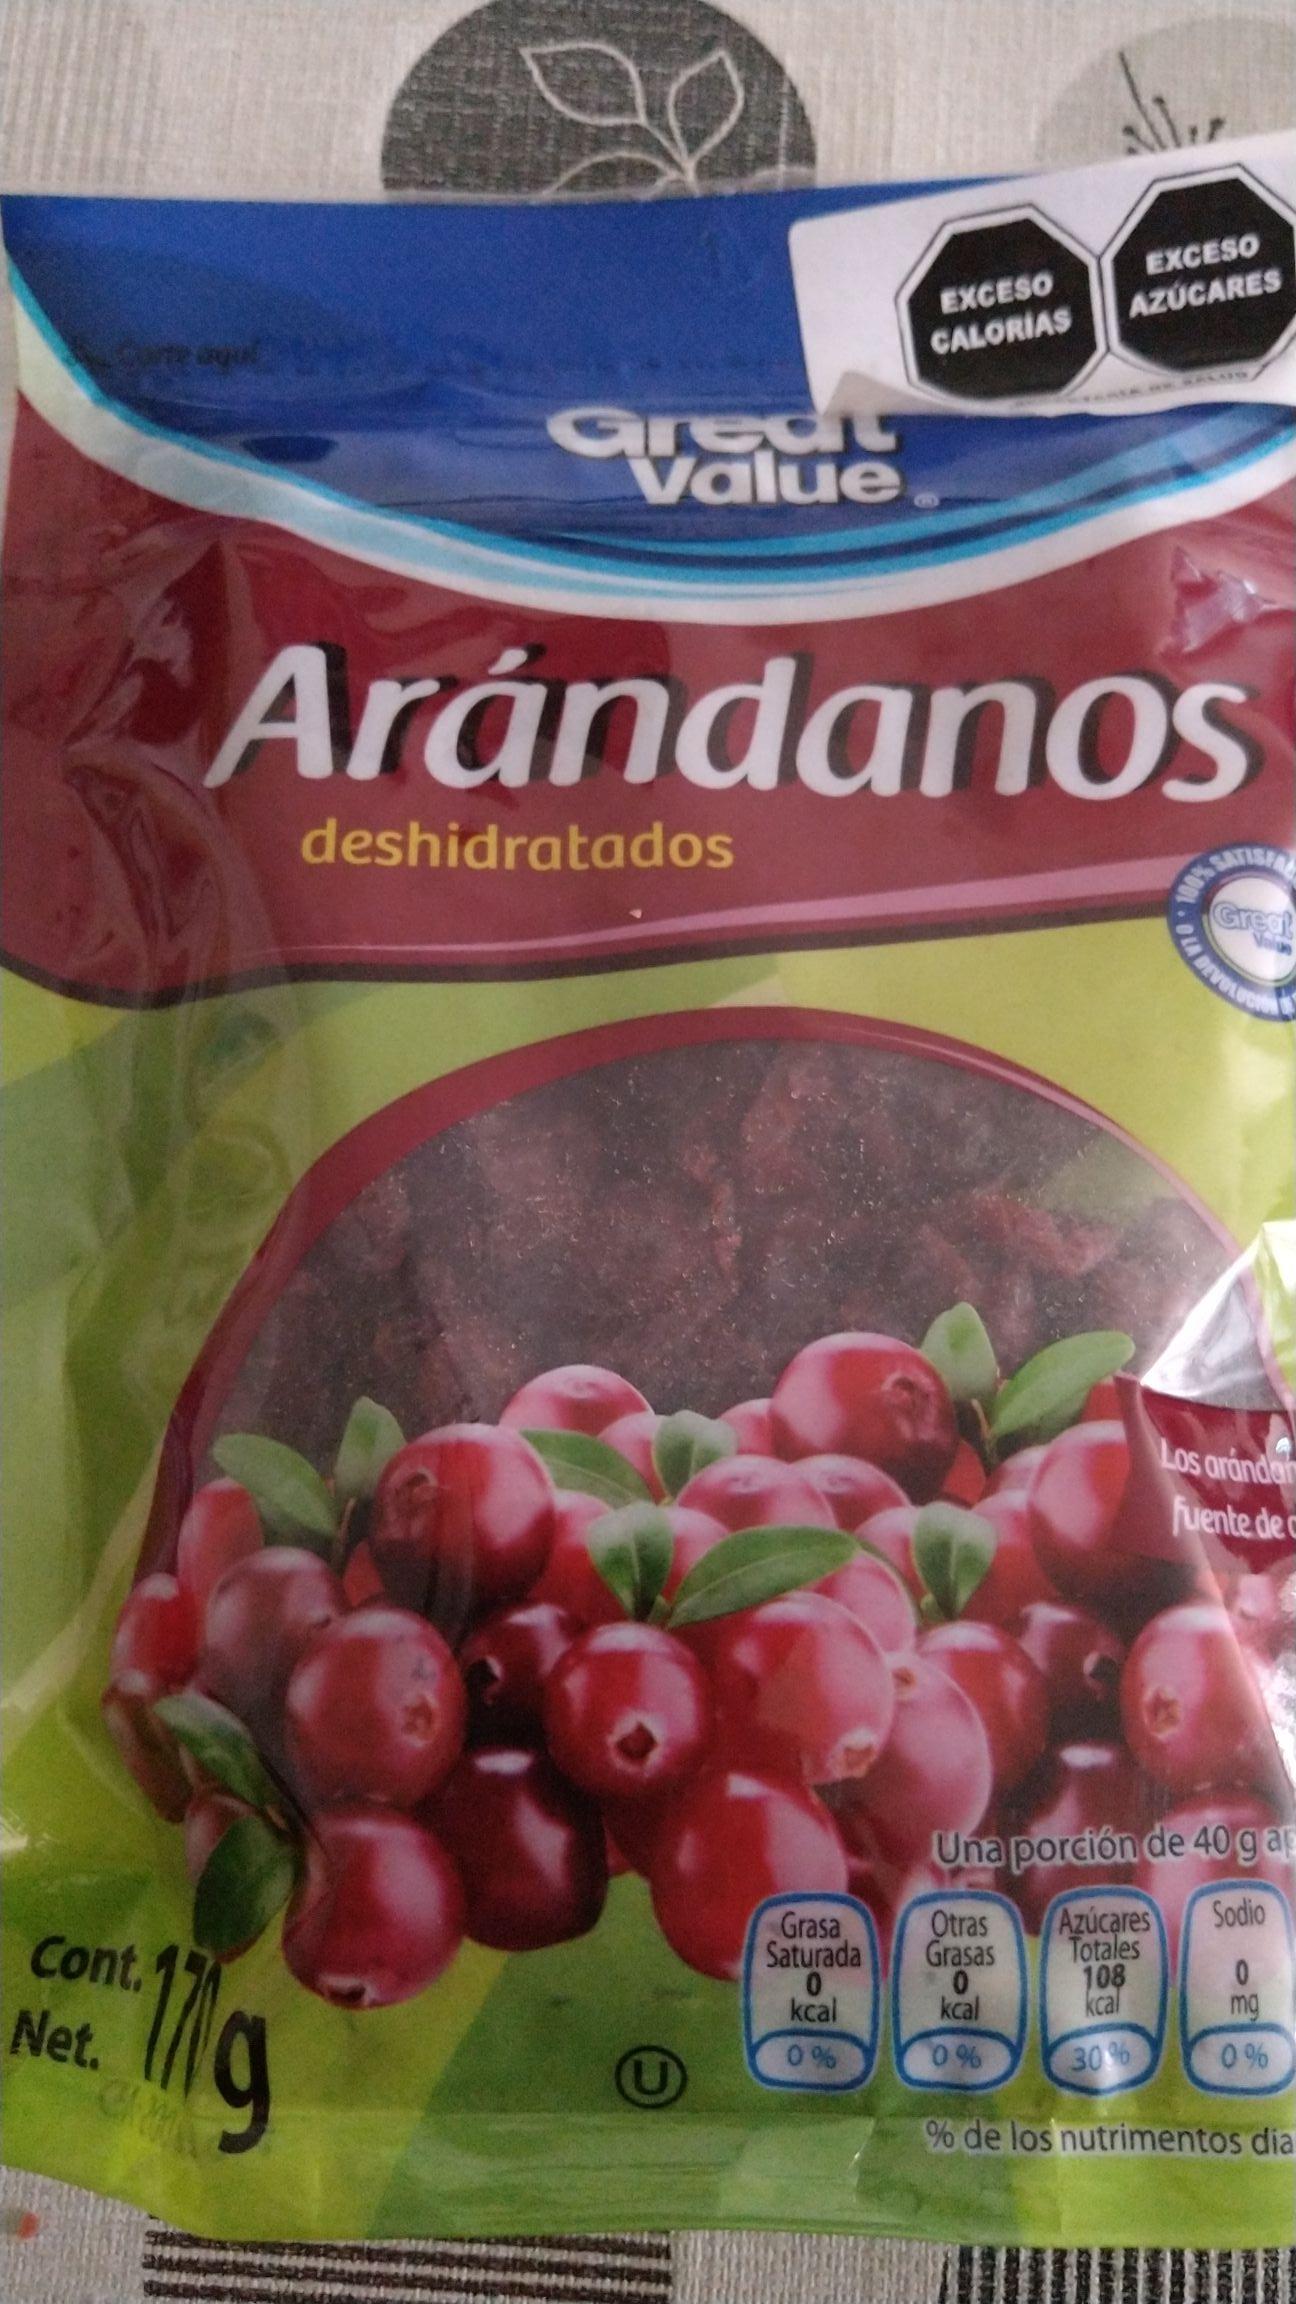 Bodega Aurrerá: Express Arándanos Deshidratados 170g